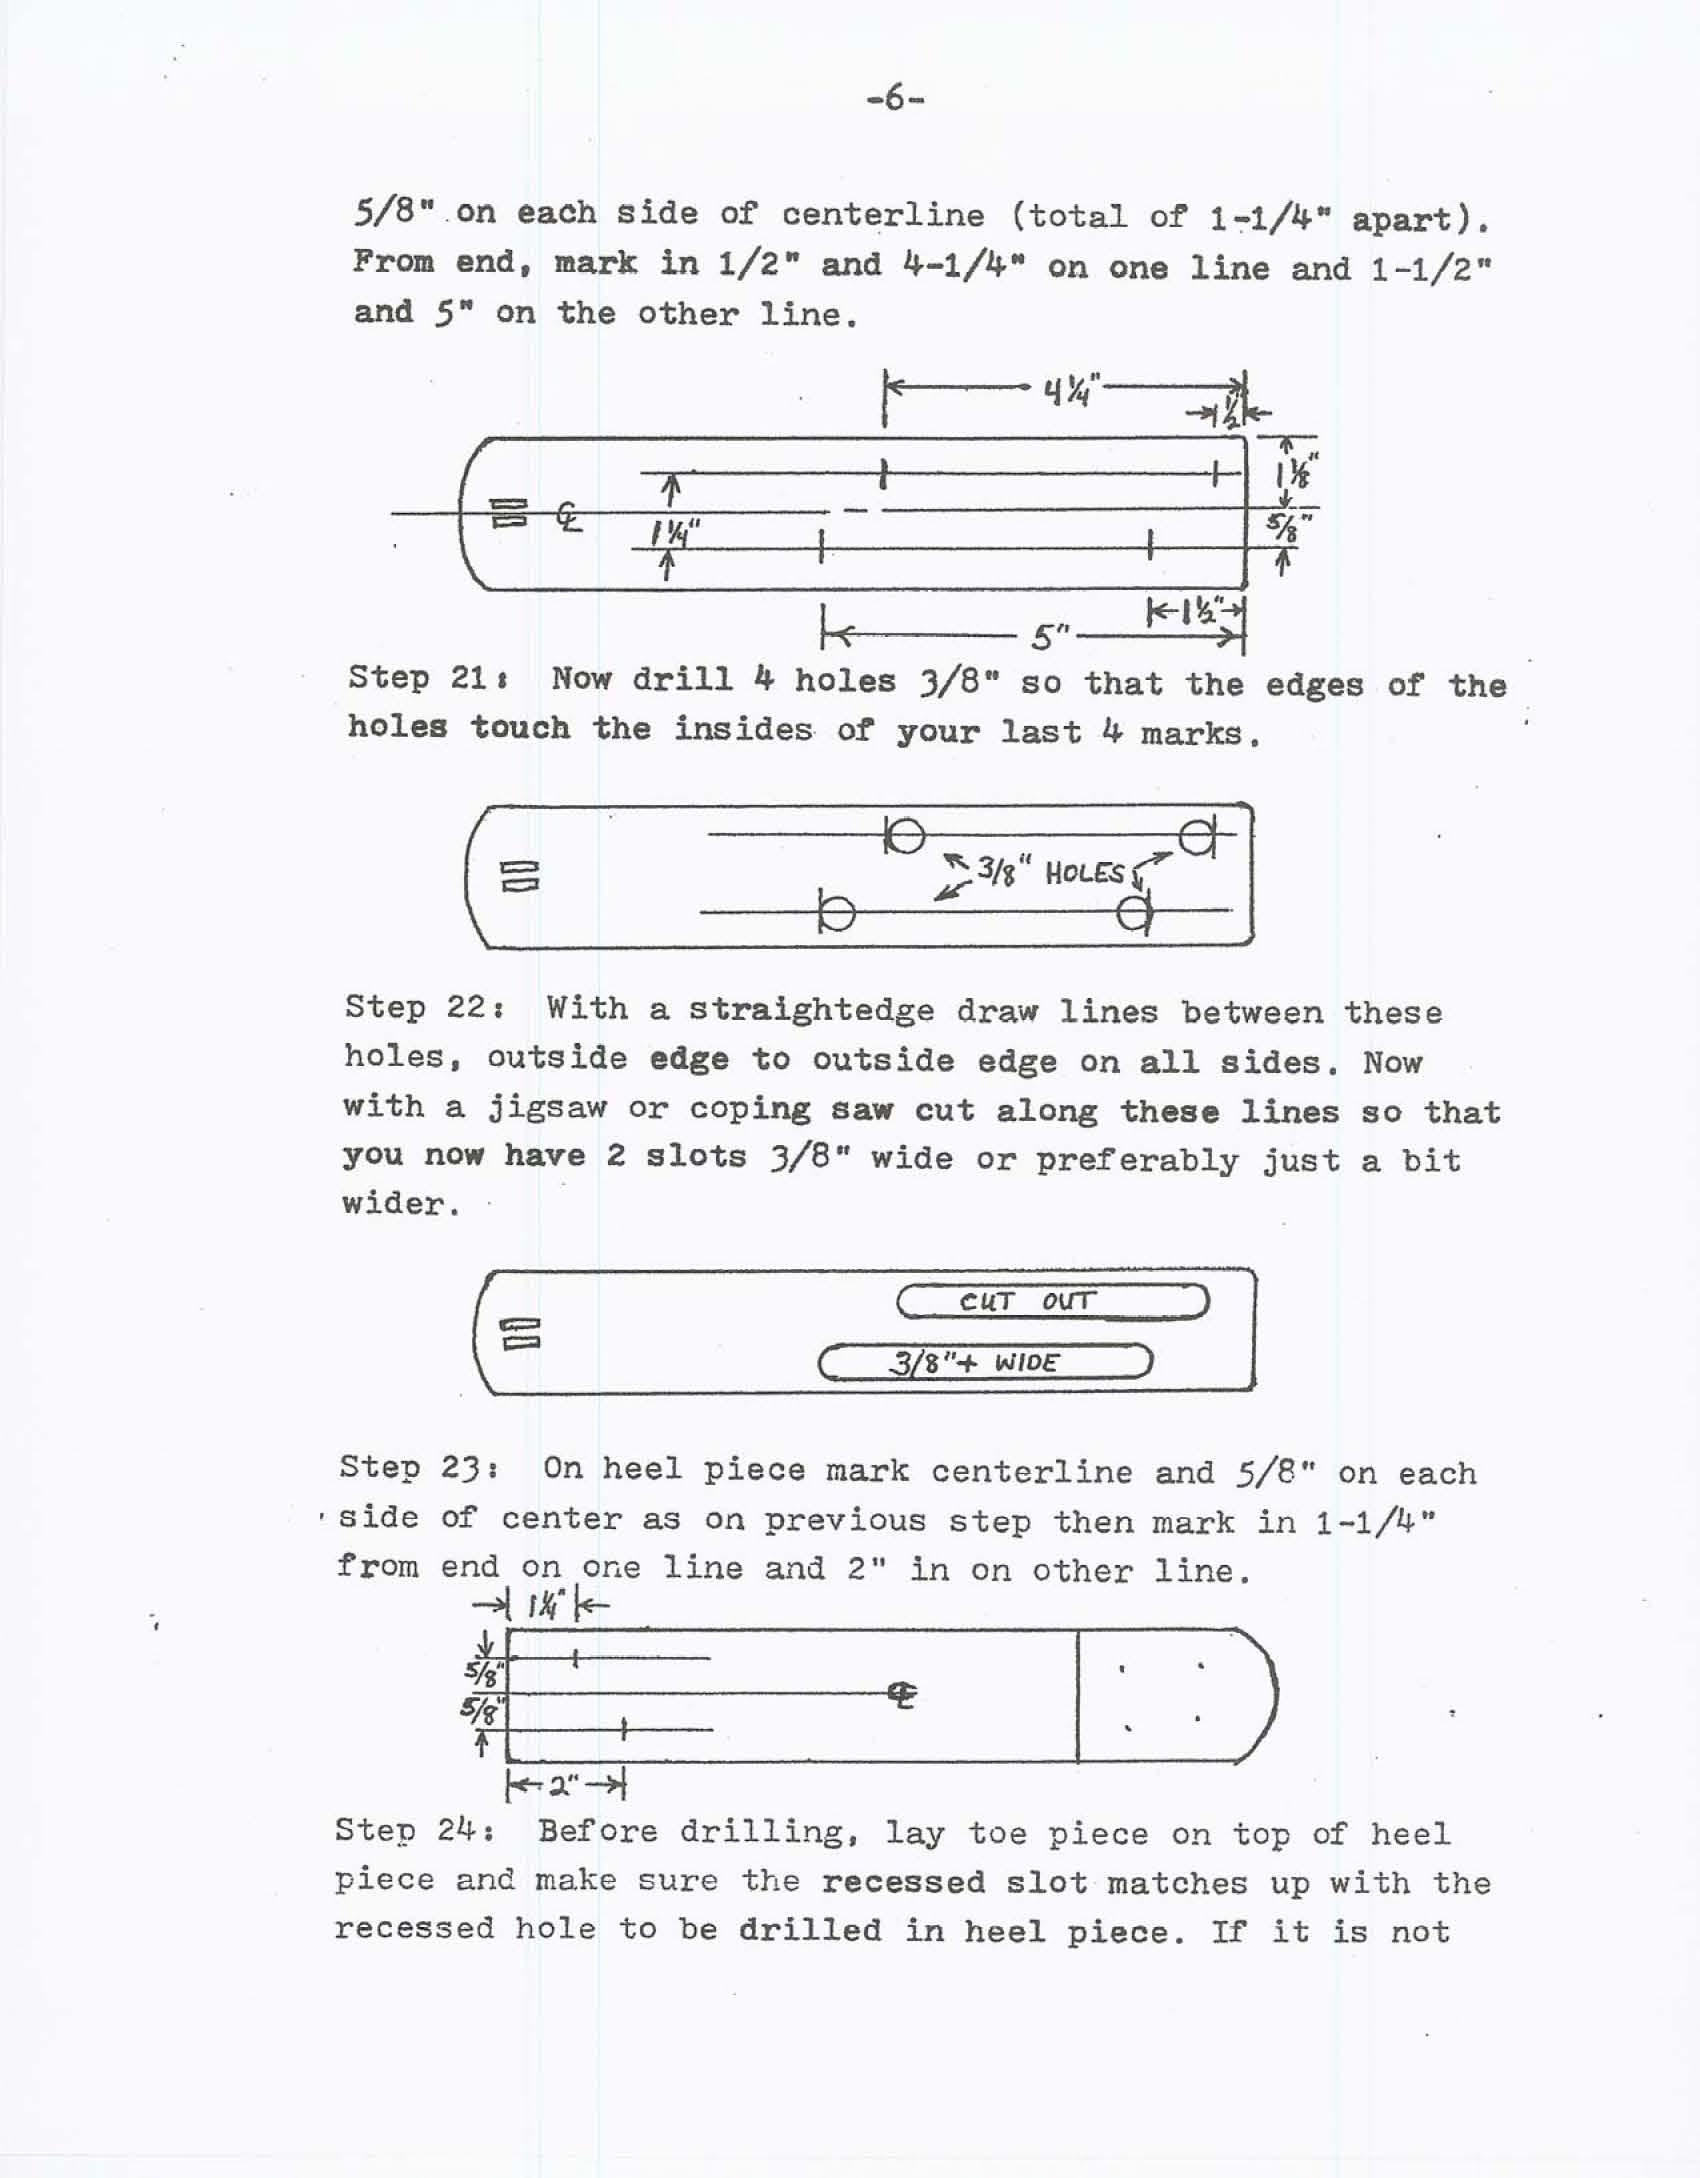 toolbenchplans-img-6.jpg